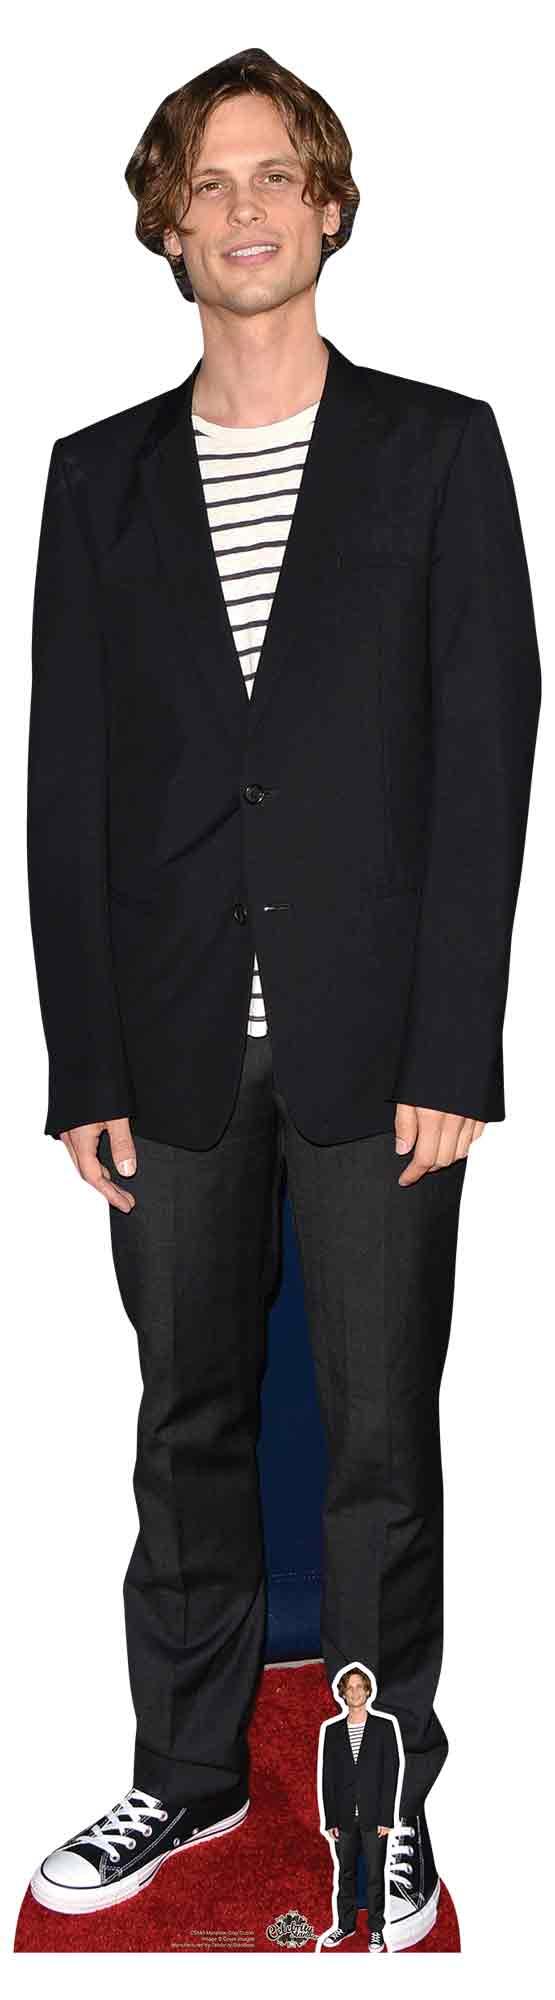 Matthew Gray Gubler Black Jacket Celebrity Cardboard Cutout and FREE Mini